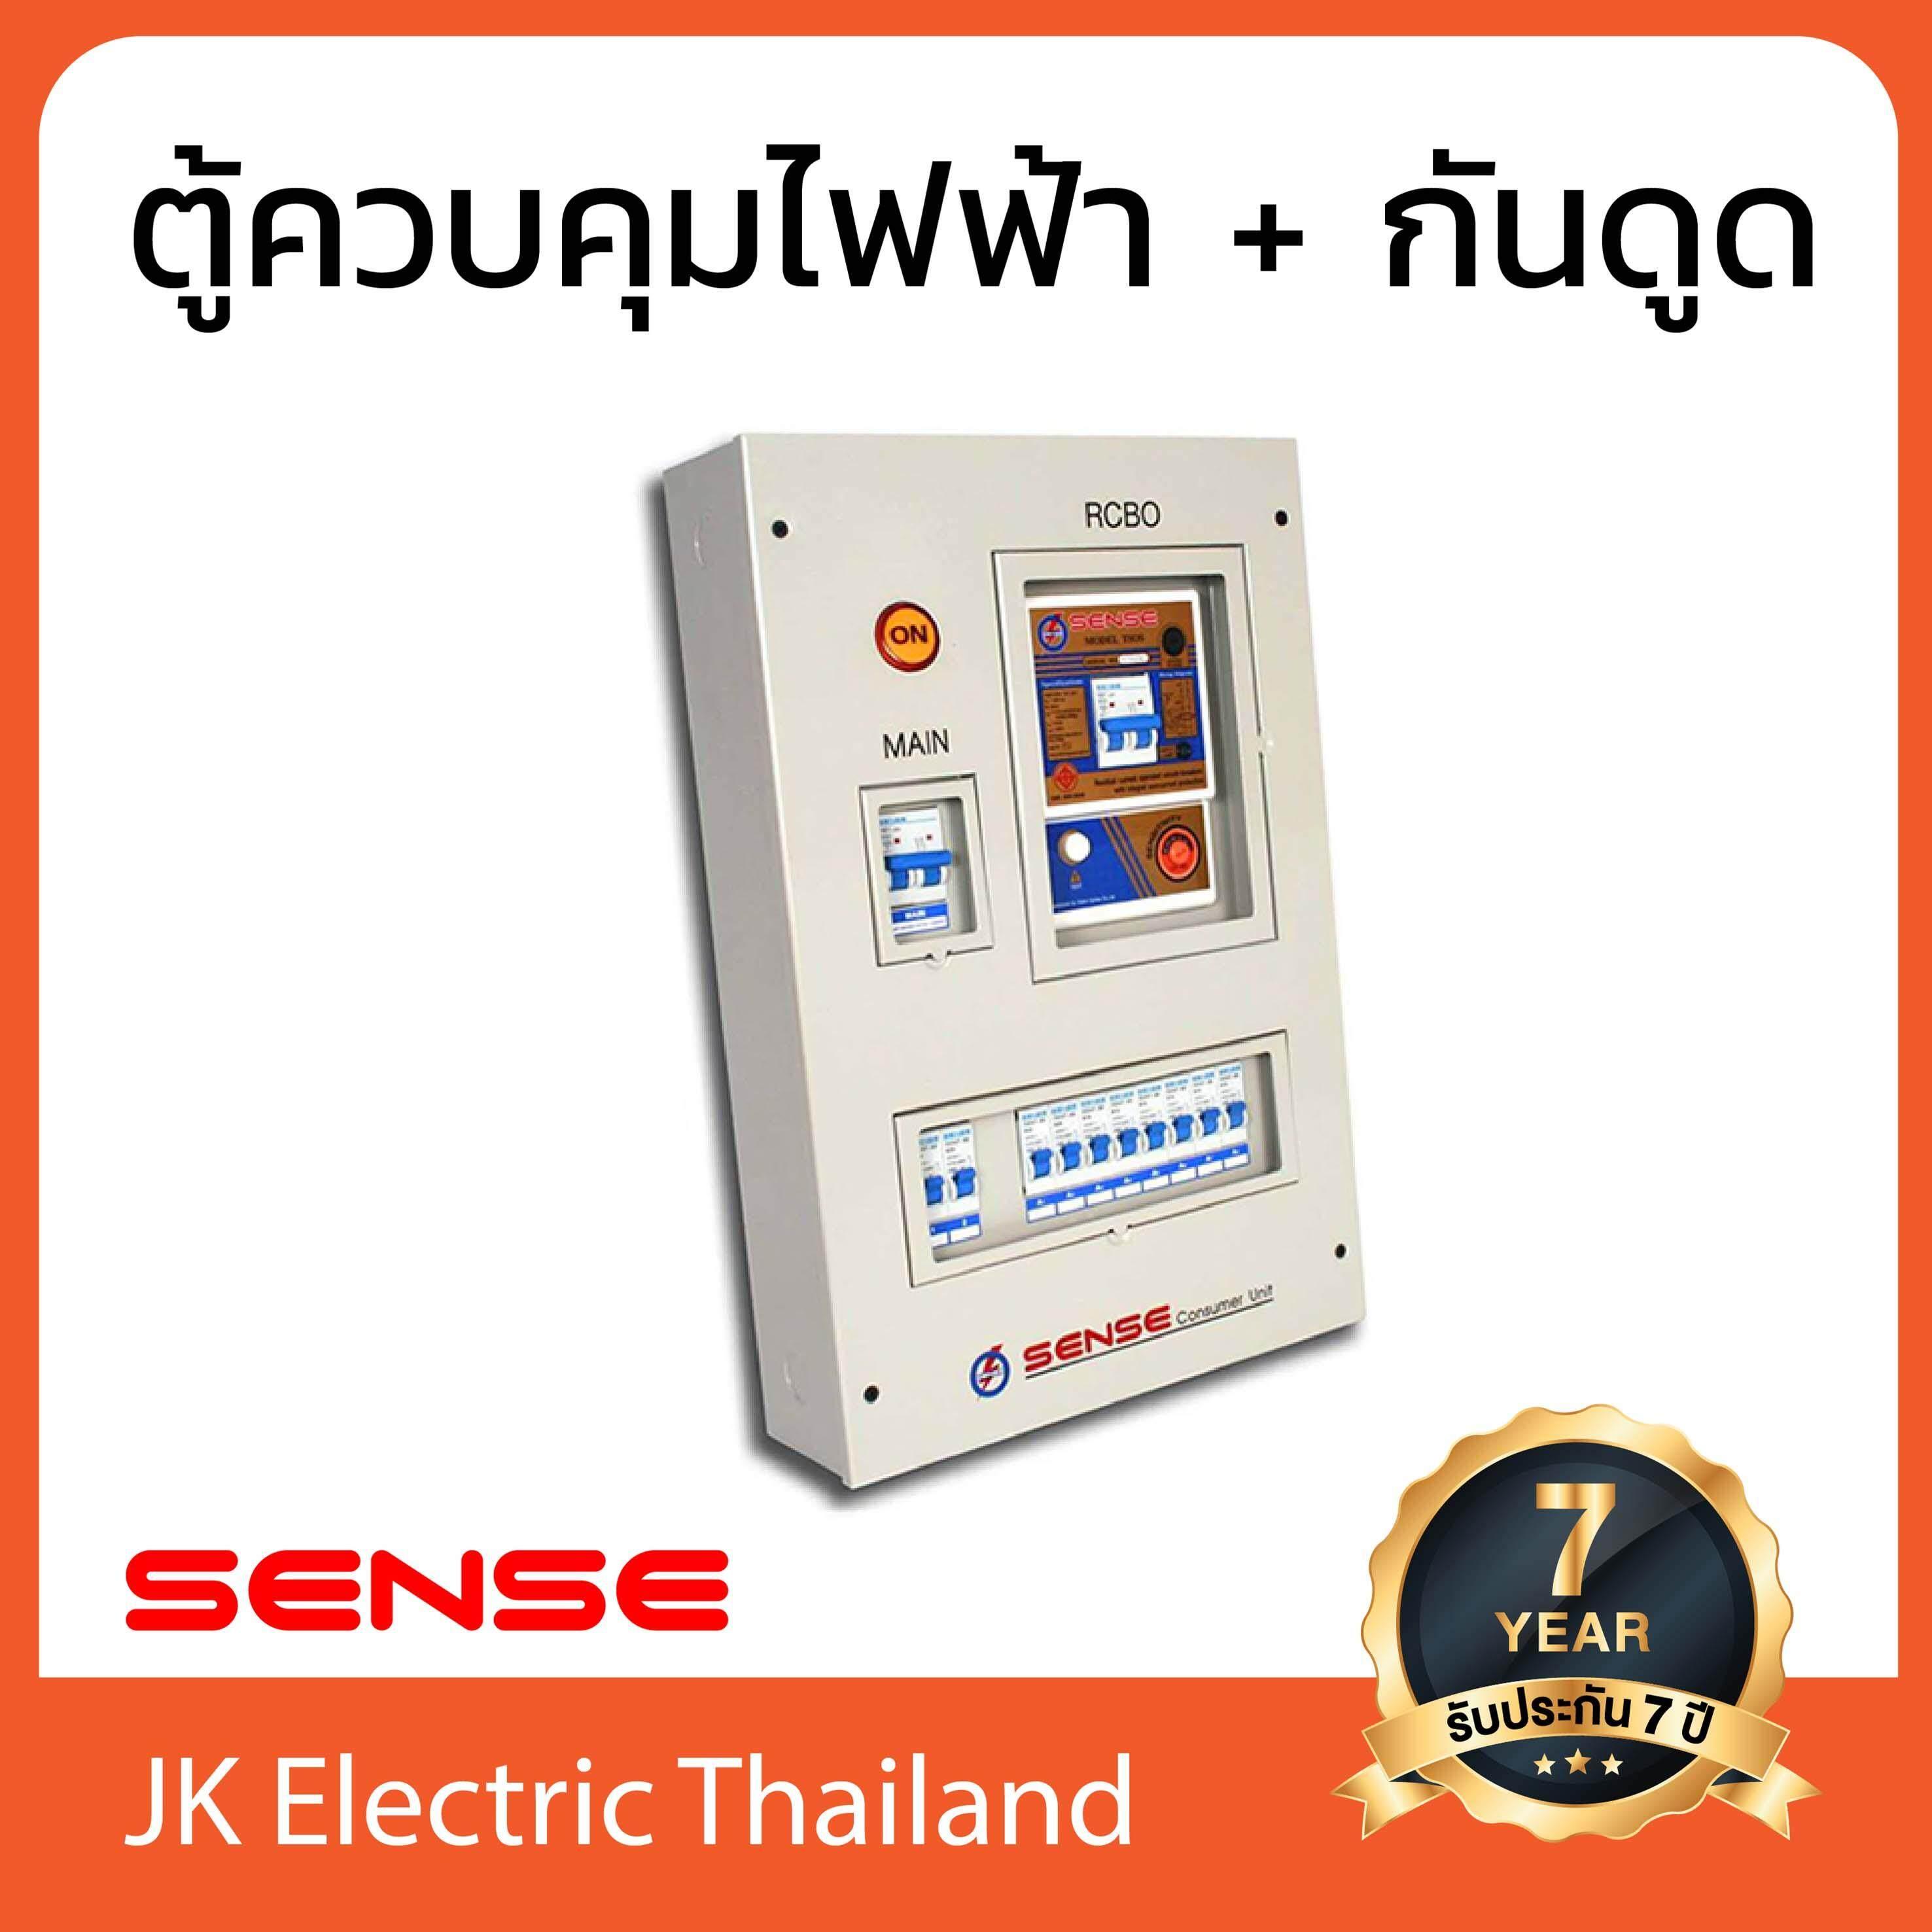 Sense ตู้ไฟ ตู้ควบคุมไฟฟ้า ตู้คอนซูมเมอร์ เซนส์ ชนิดแยกส่วน ขนาด 10 ช่อง พร้อม เครื่องตัดไฟรั่ว (rcd) รุ่น Ts10 (เลือกขนาดเมน 32a, 50a, 63a และลูกย่อย 10a, 16a, 20a, 32a ตามต้องการ) ป้องกันไฟดูด ไฟช็อต ไฟรั่ว ใช้ไฟเกิน.